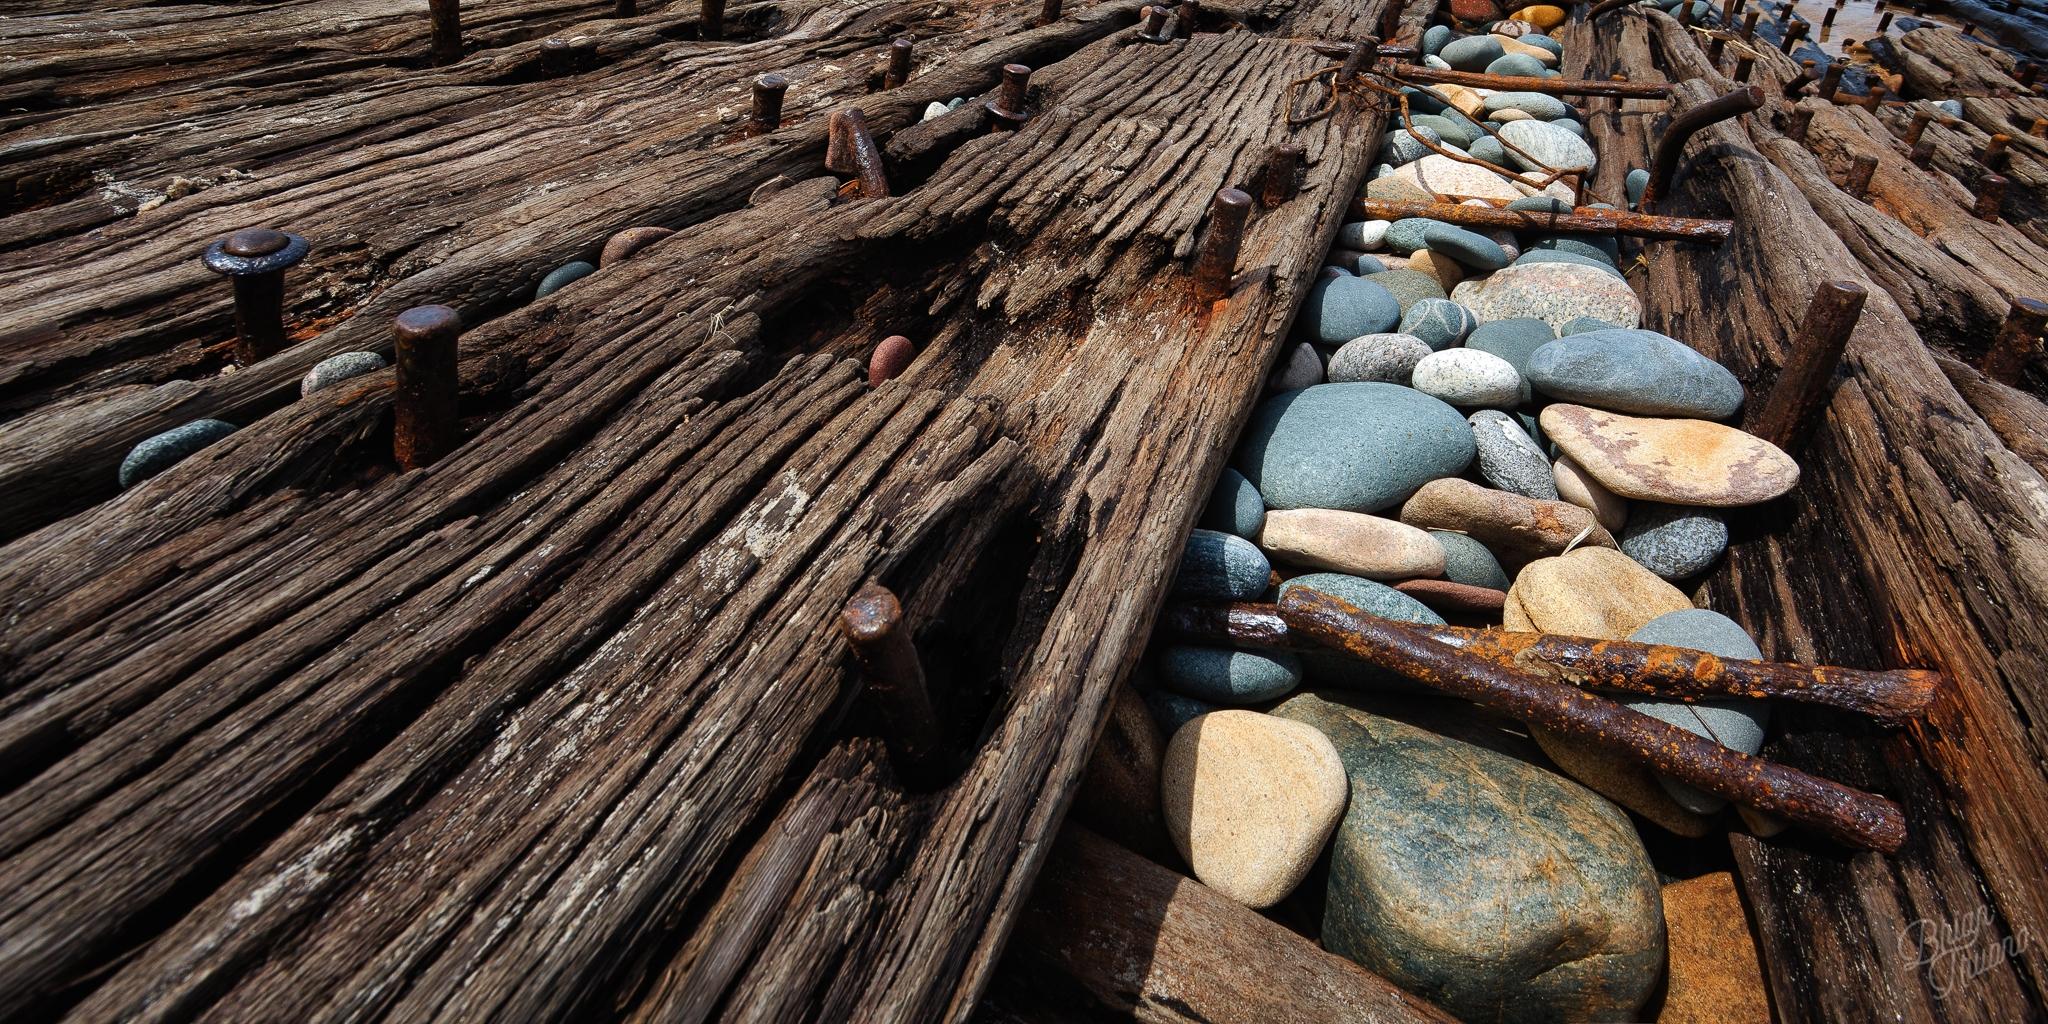 Shipwrecked_BTruono_fbgp.jpg